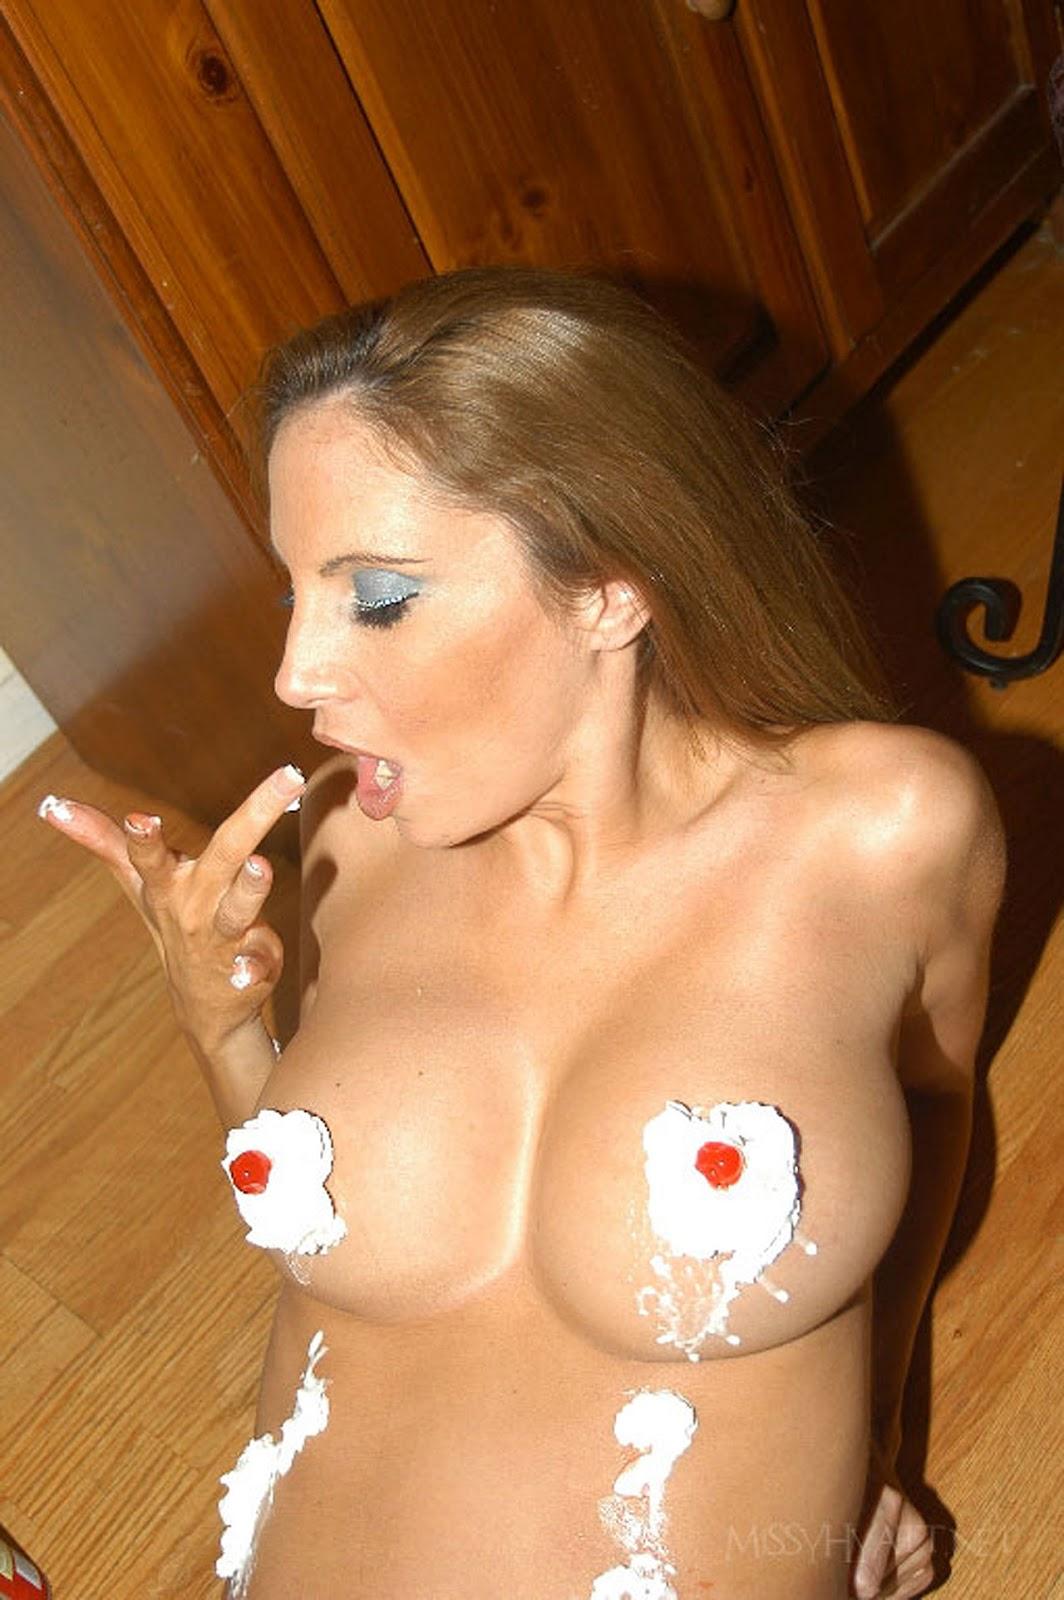 www intercourse mature girl